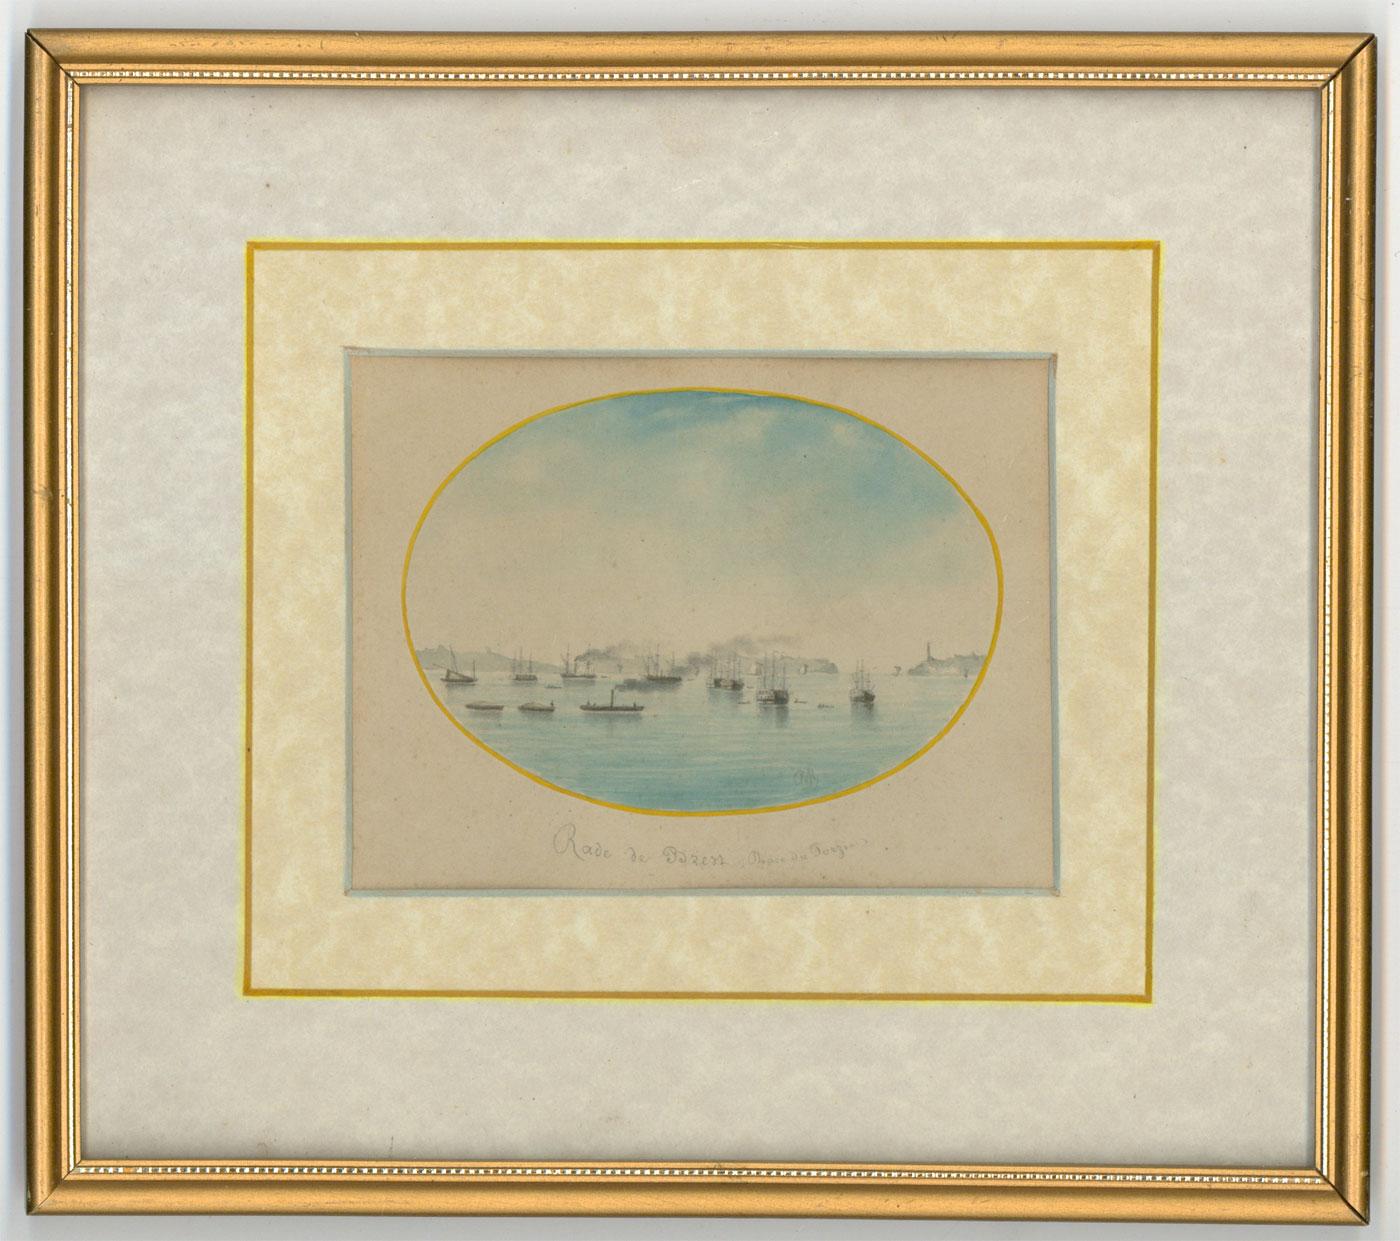 O.M. - Gilt Framed 19th Century Miniature Watercolour, Roadstead. O.M.